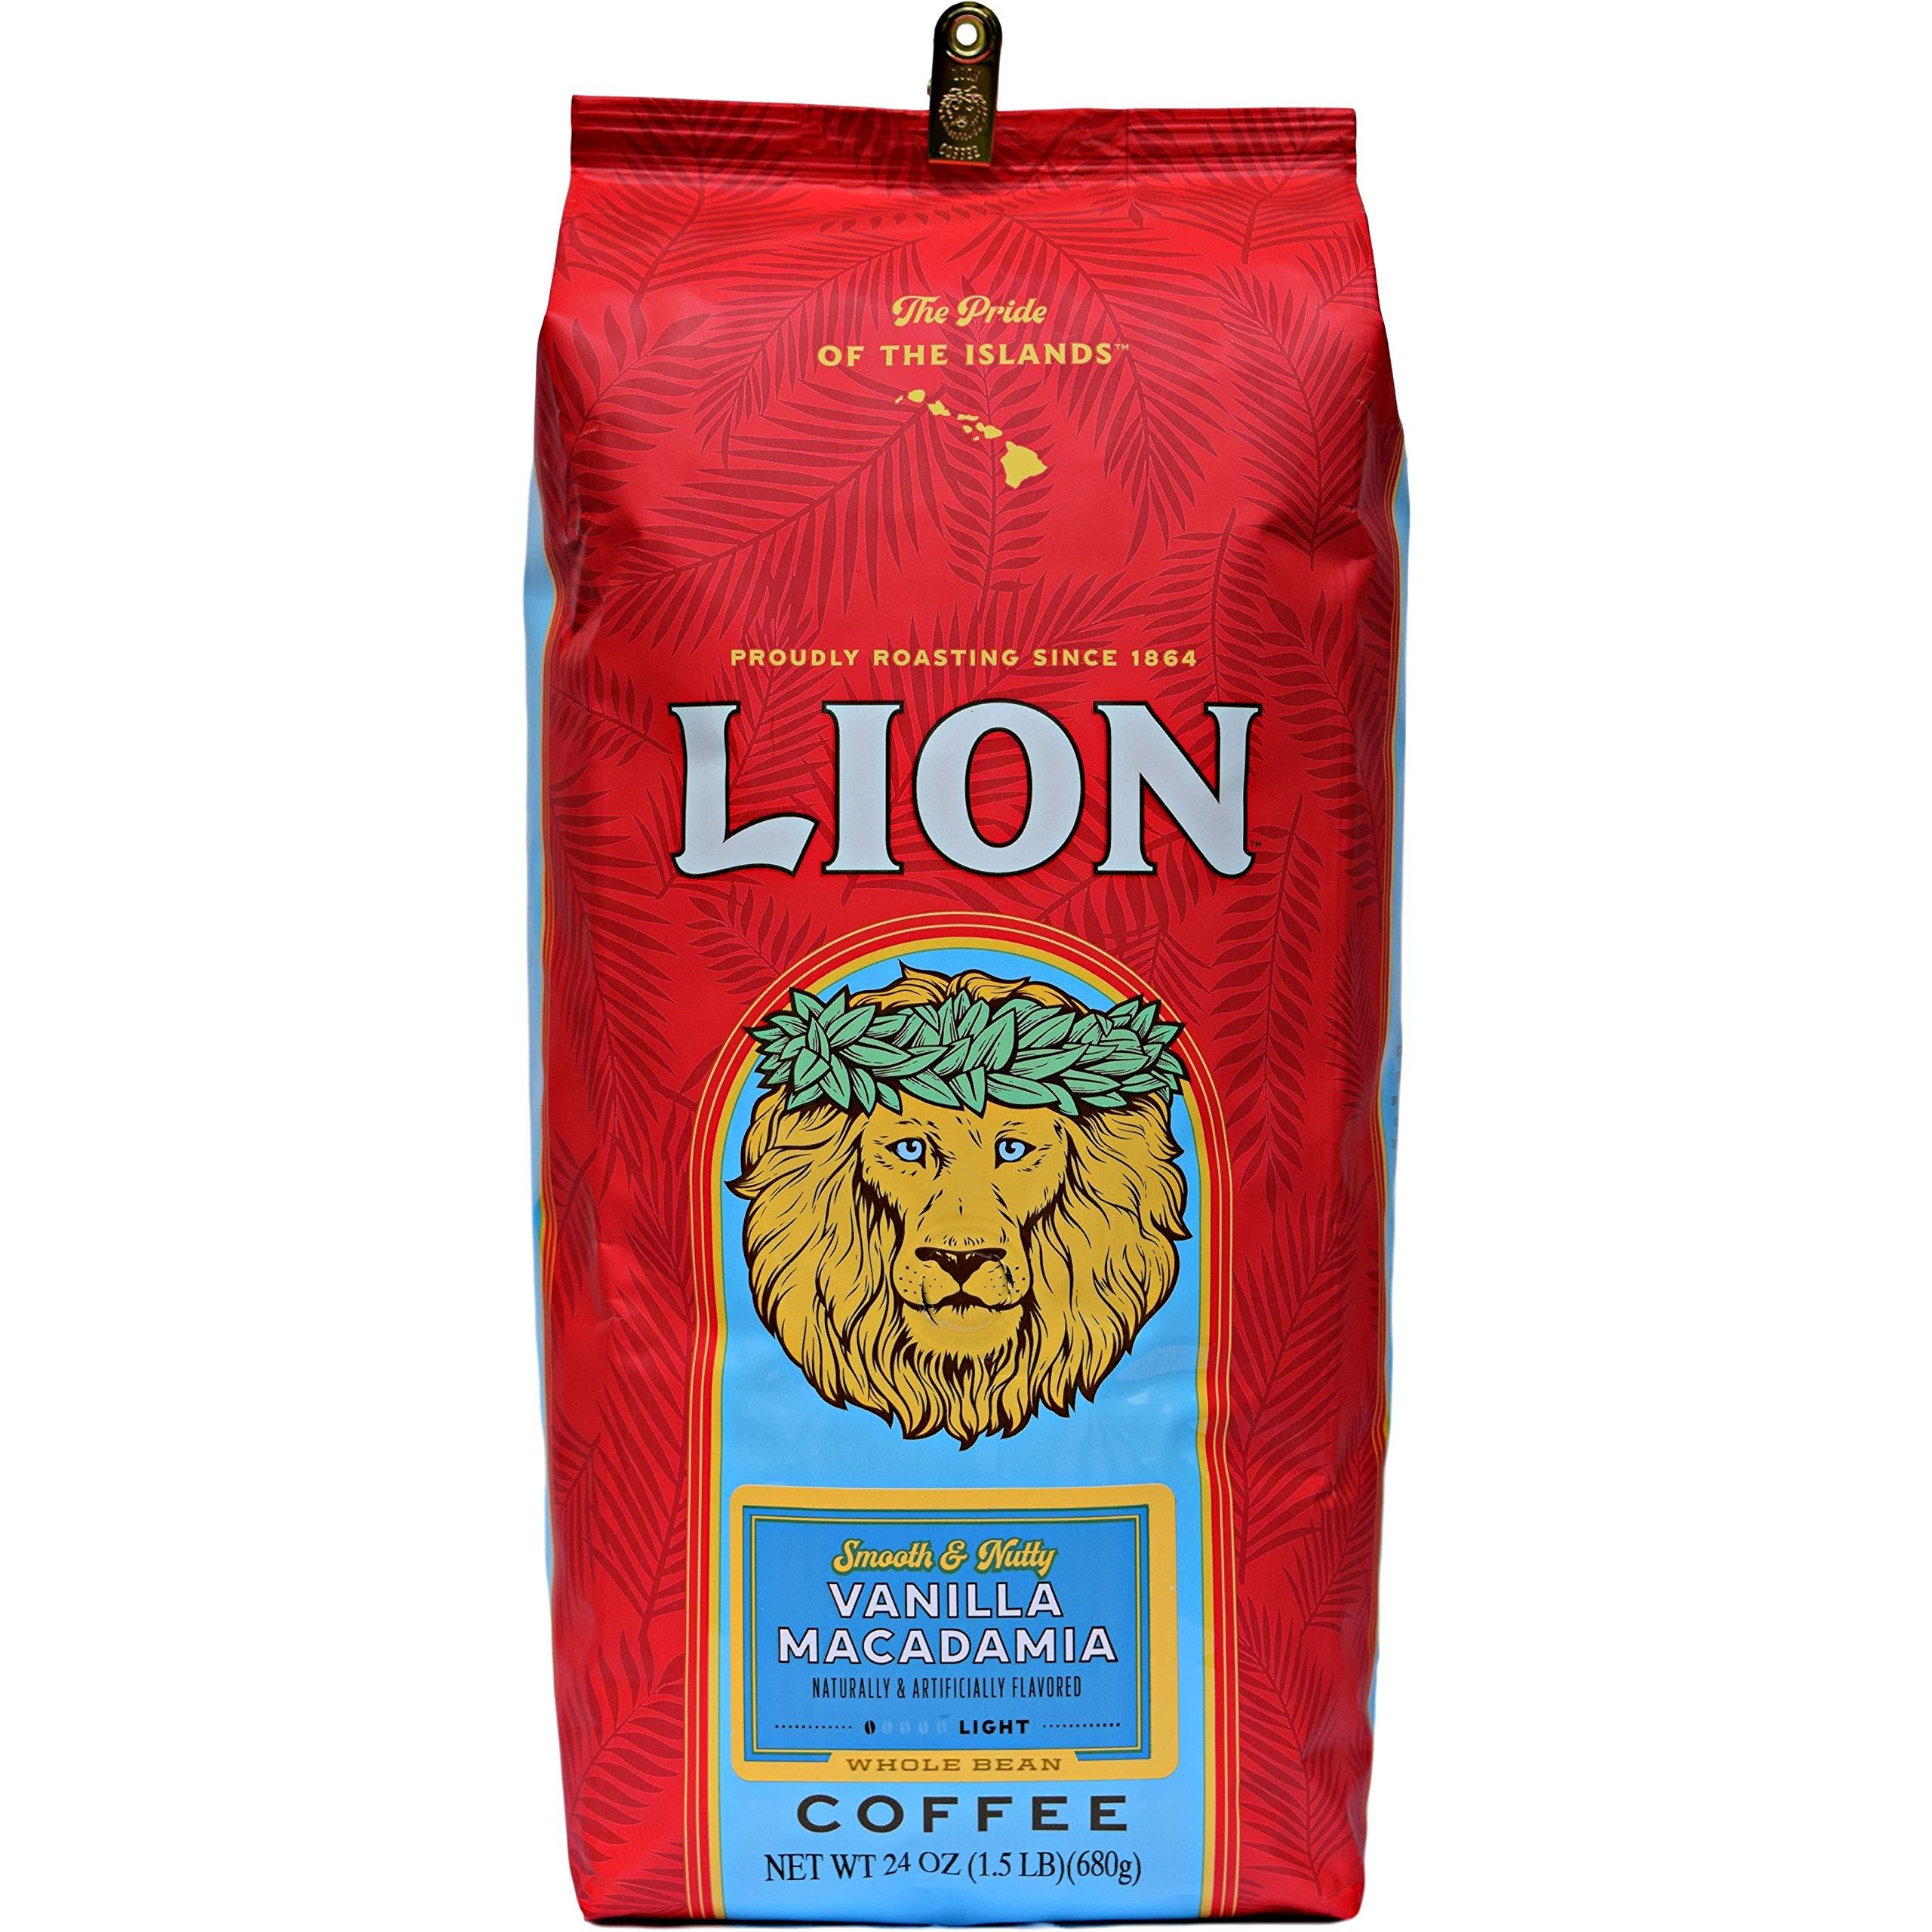 Lion Coffee, Vanilla Macadamia Flavor, Light Roast, Whole Bean, 24 Ounce Bag